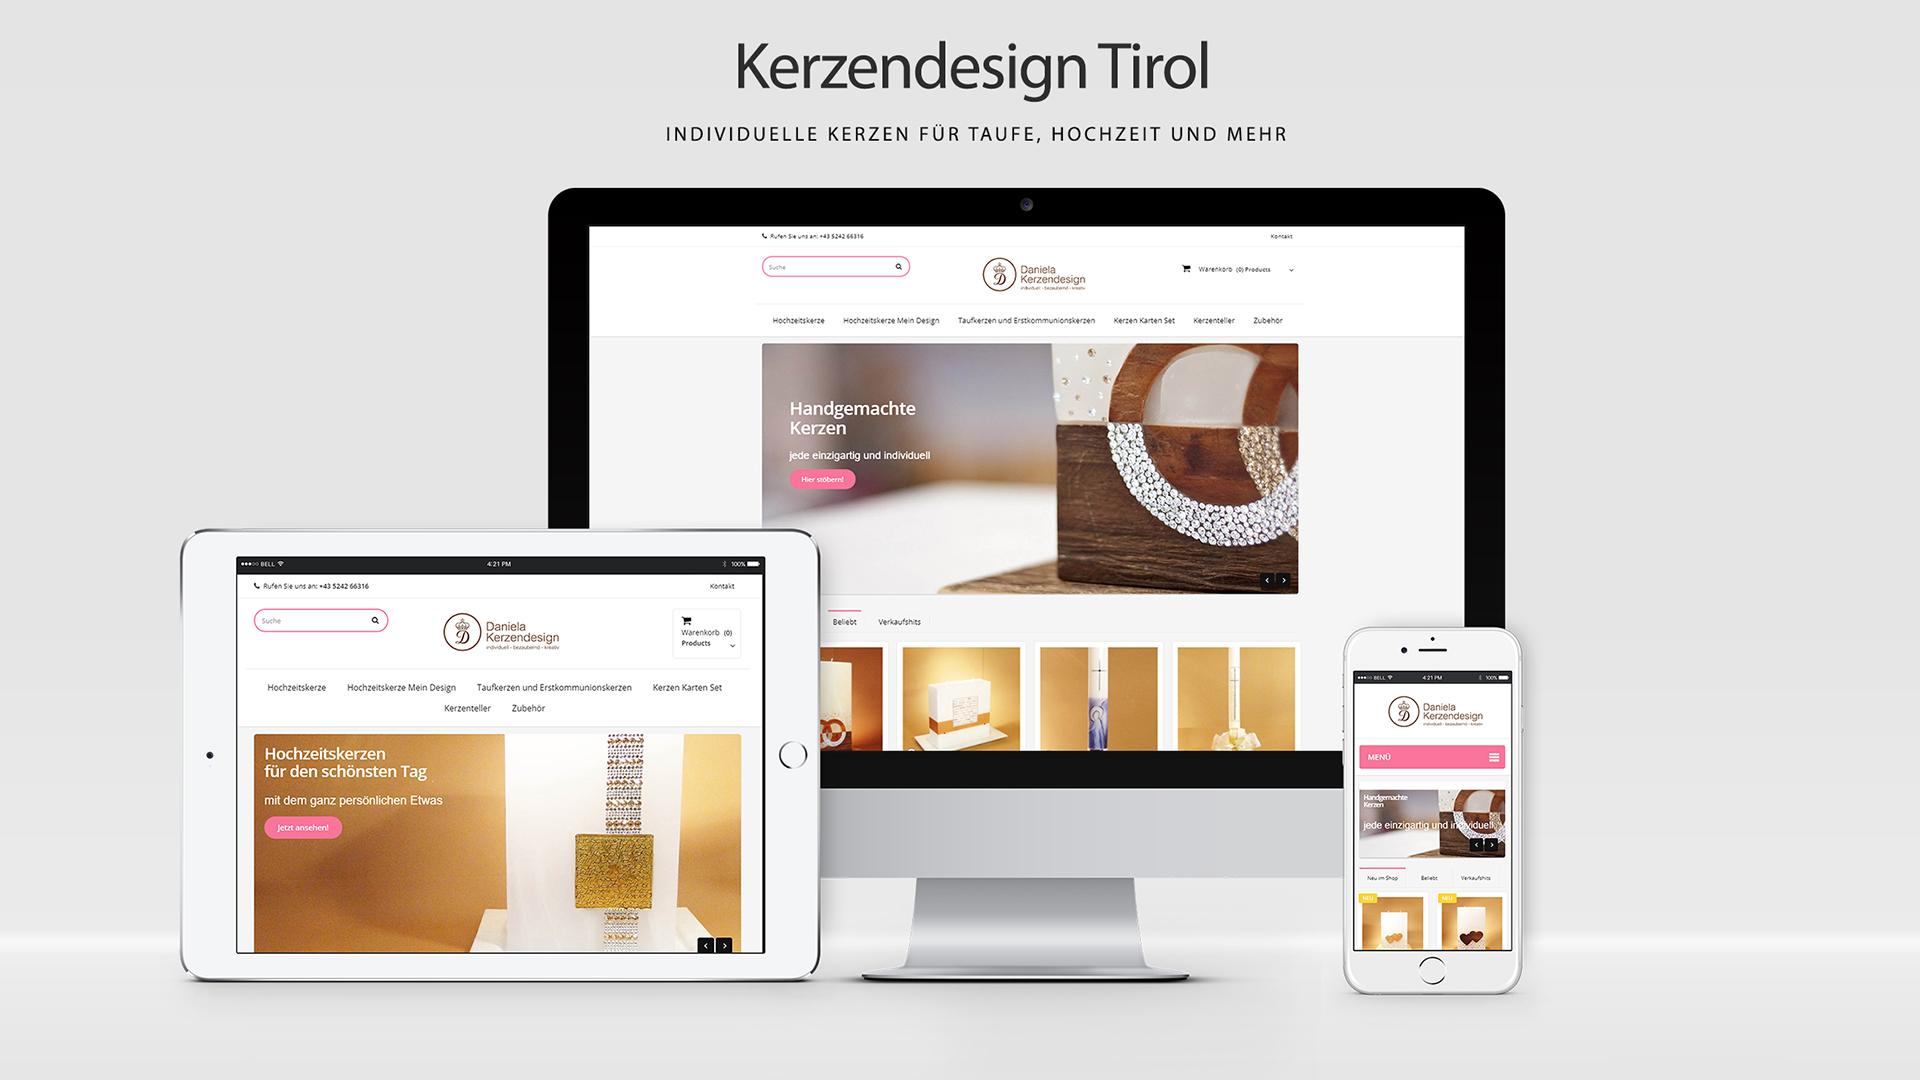 Kerzendesign Tirol PrestaShop  Online Shop